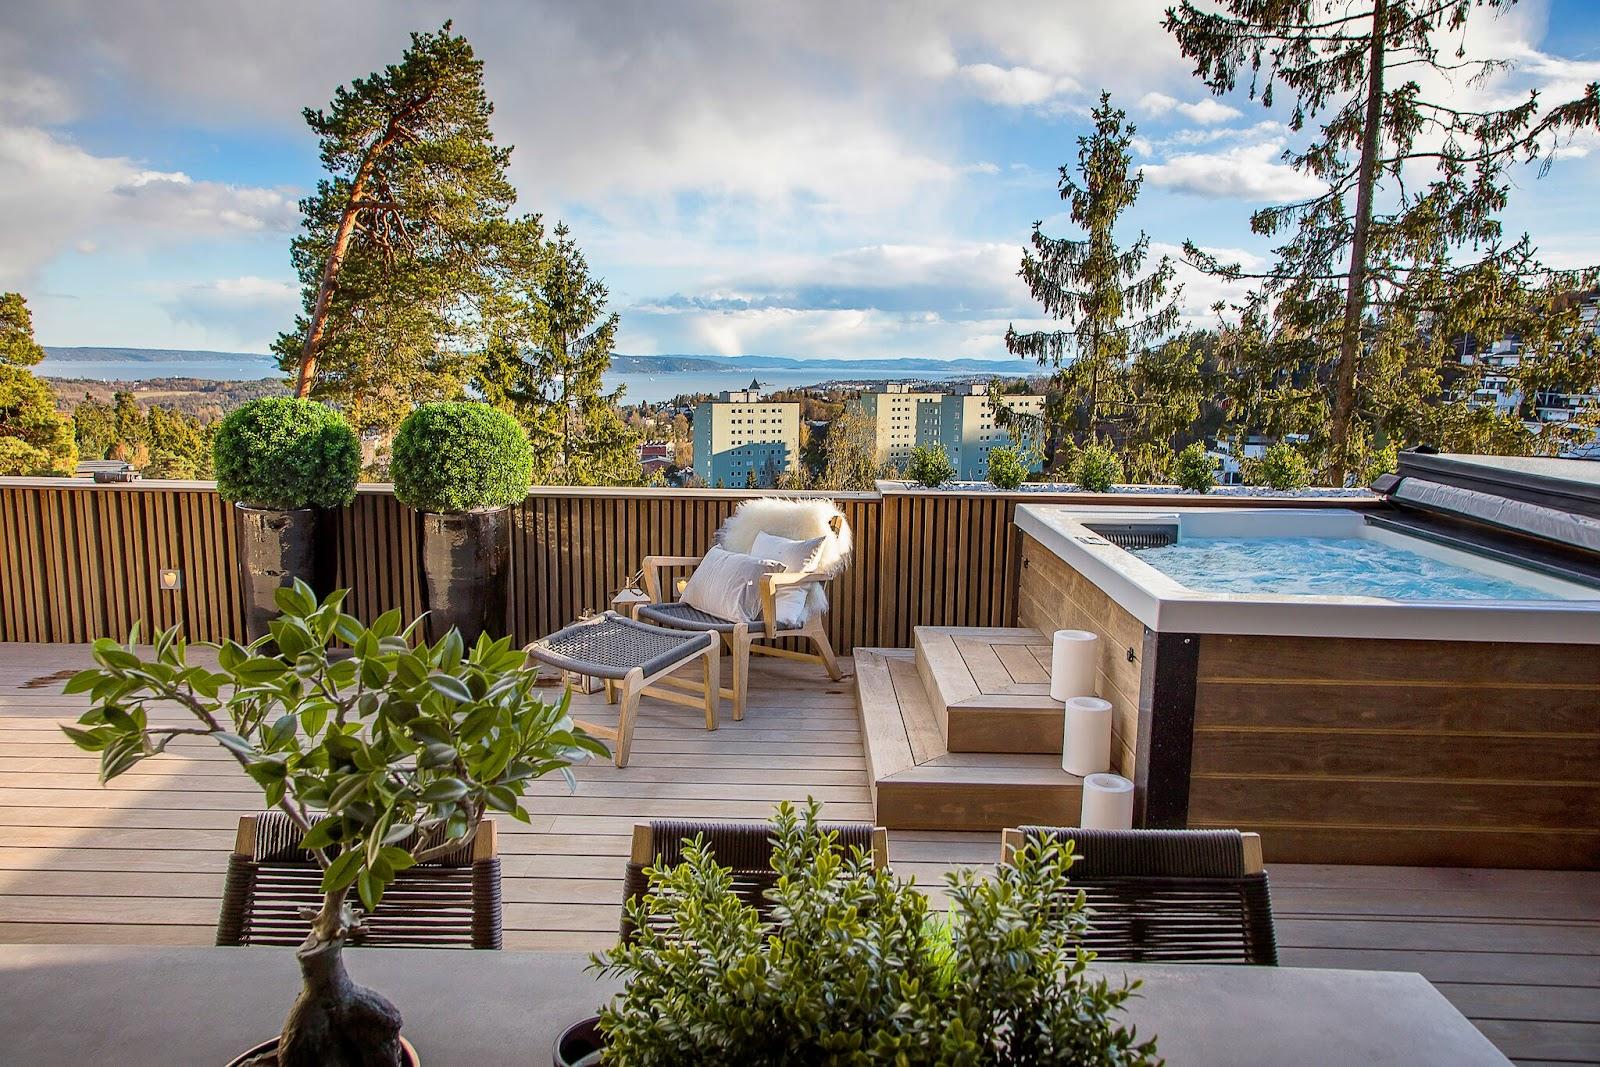 terrasse med boblebad